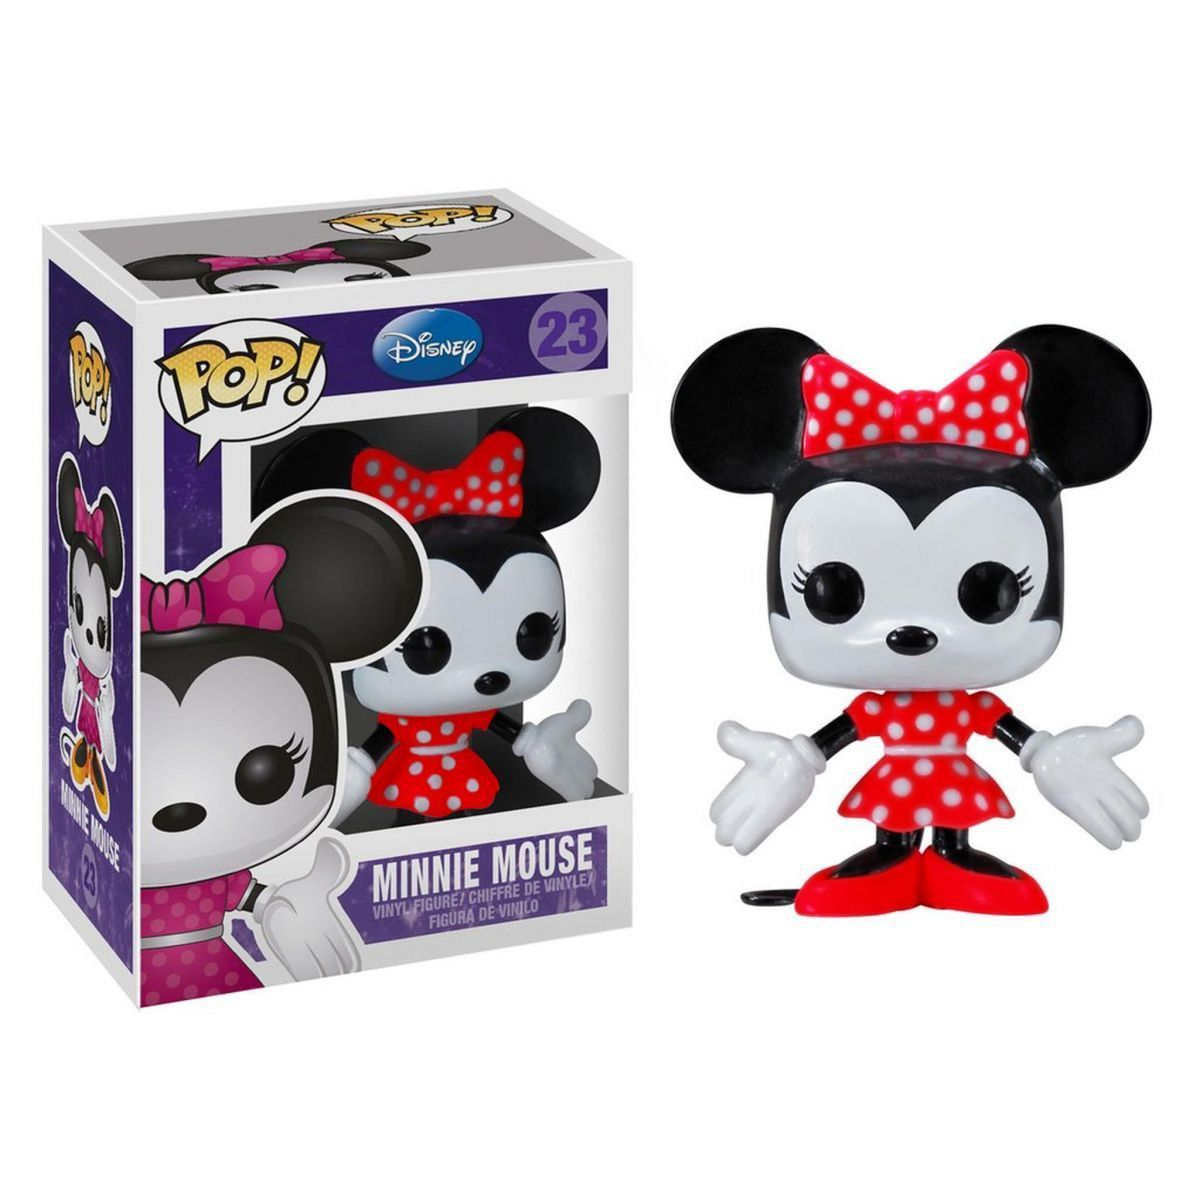 Funko Pop Minnie Mouse (Vermelho): Disney #23 - Funko